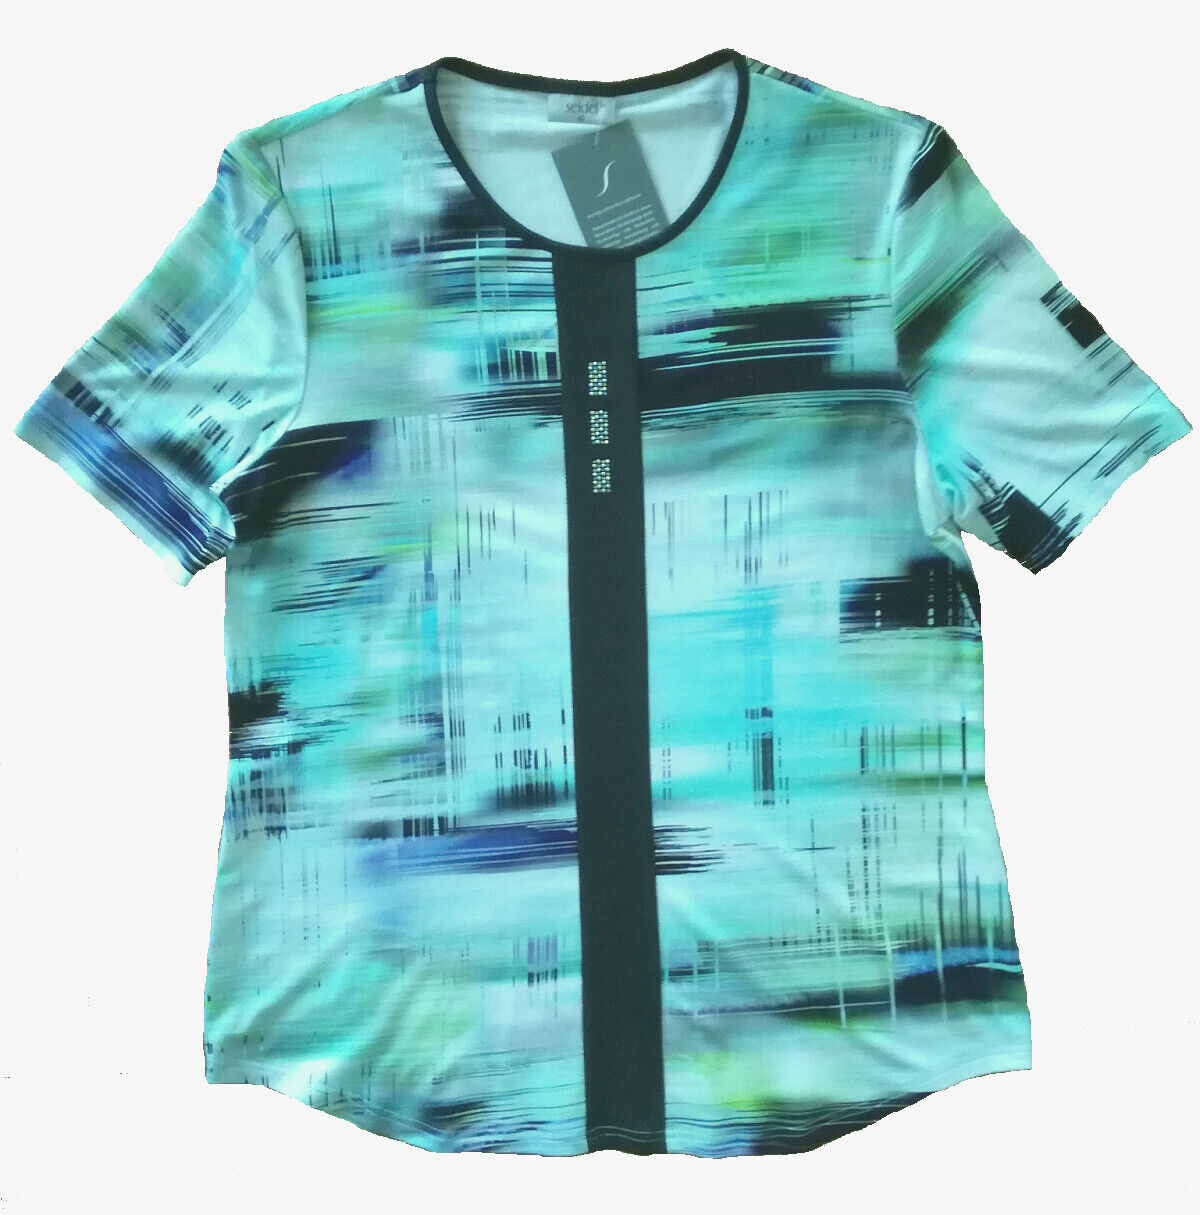 Seidel Moden Blausenshirt Blausenshirt Blausenshirt 1 2 Arm weiss-blau-grün-türkis Aquatöne Damenshirt | Sale Düsseldorf  | Ab dem neuesten Modell  63da33